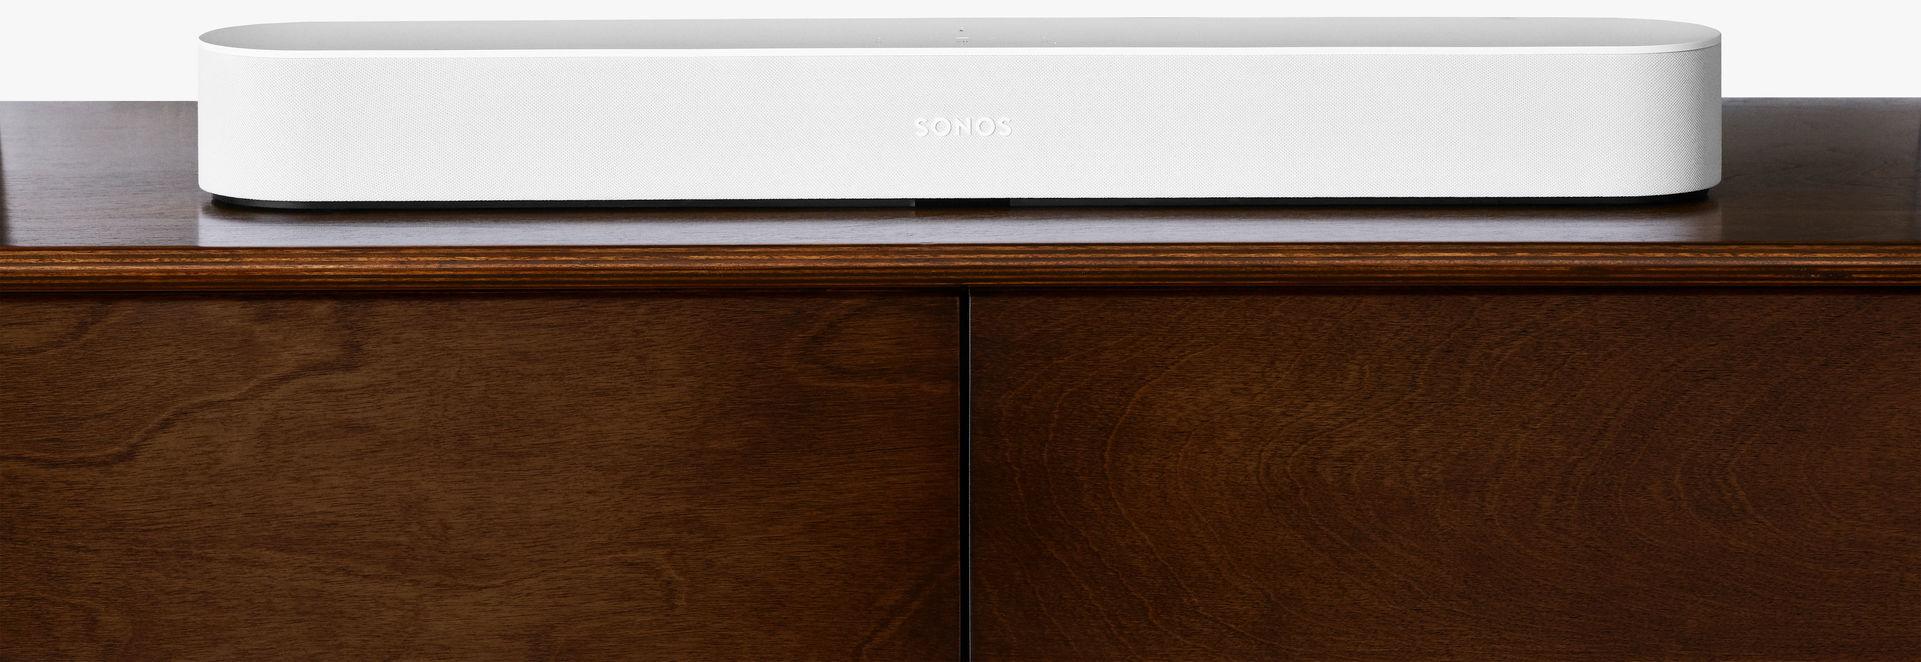 New Sonos Beam Pre-Order $399.99